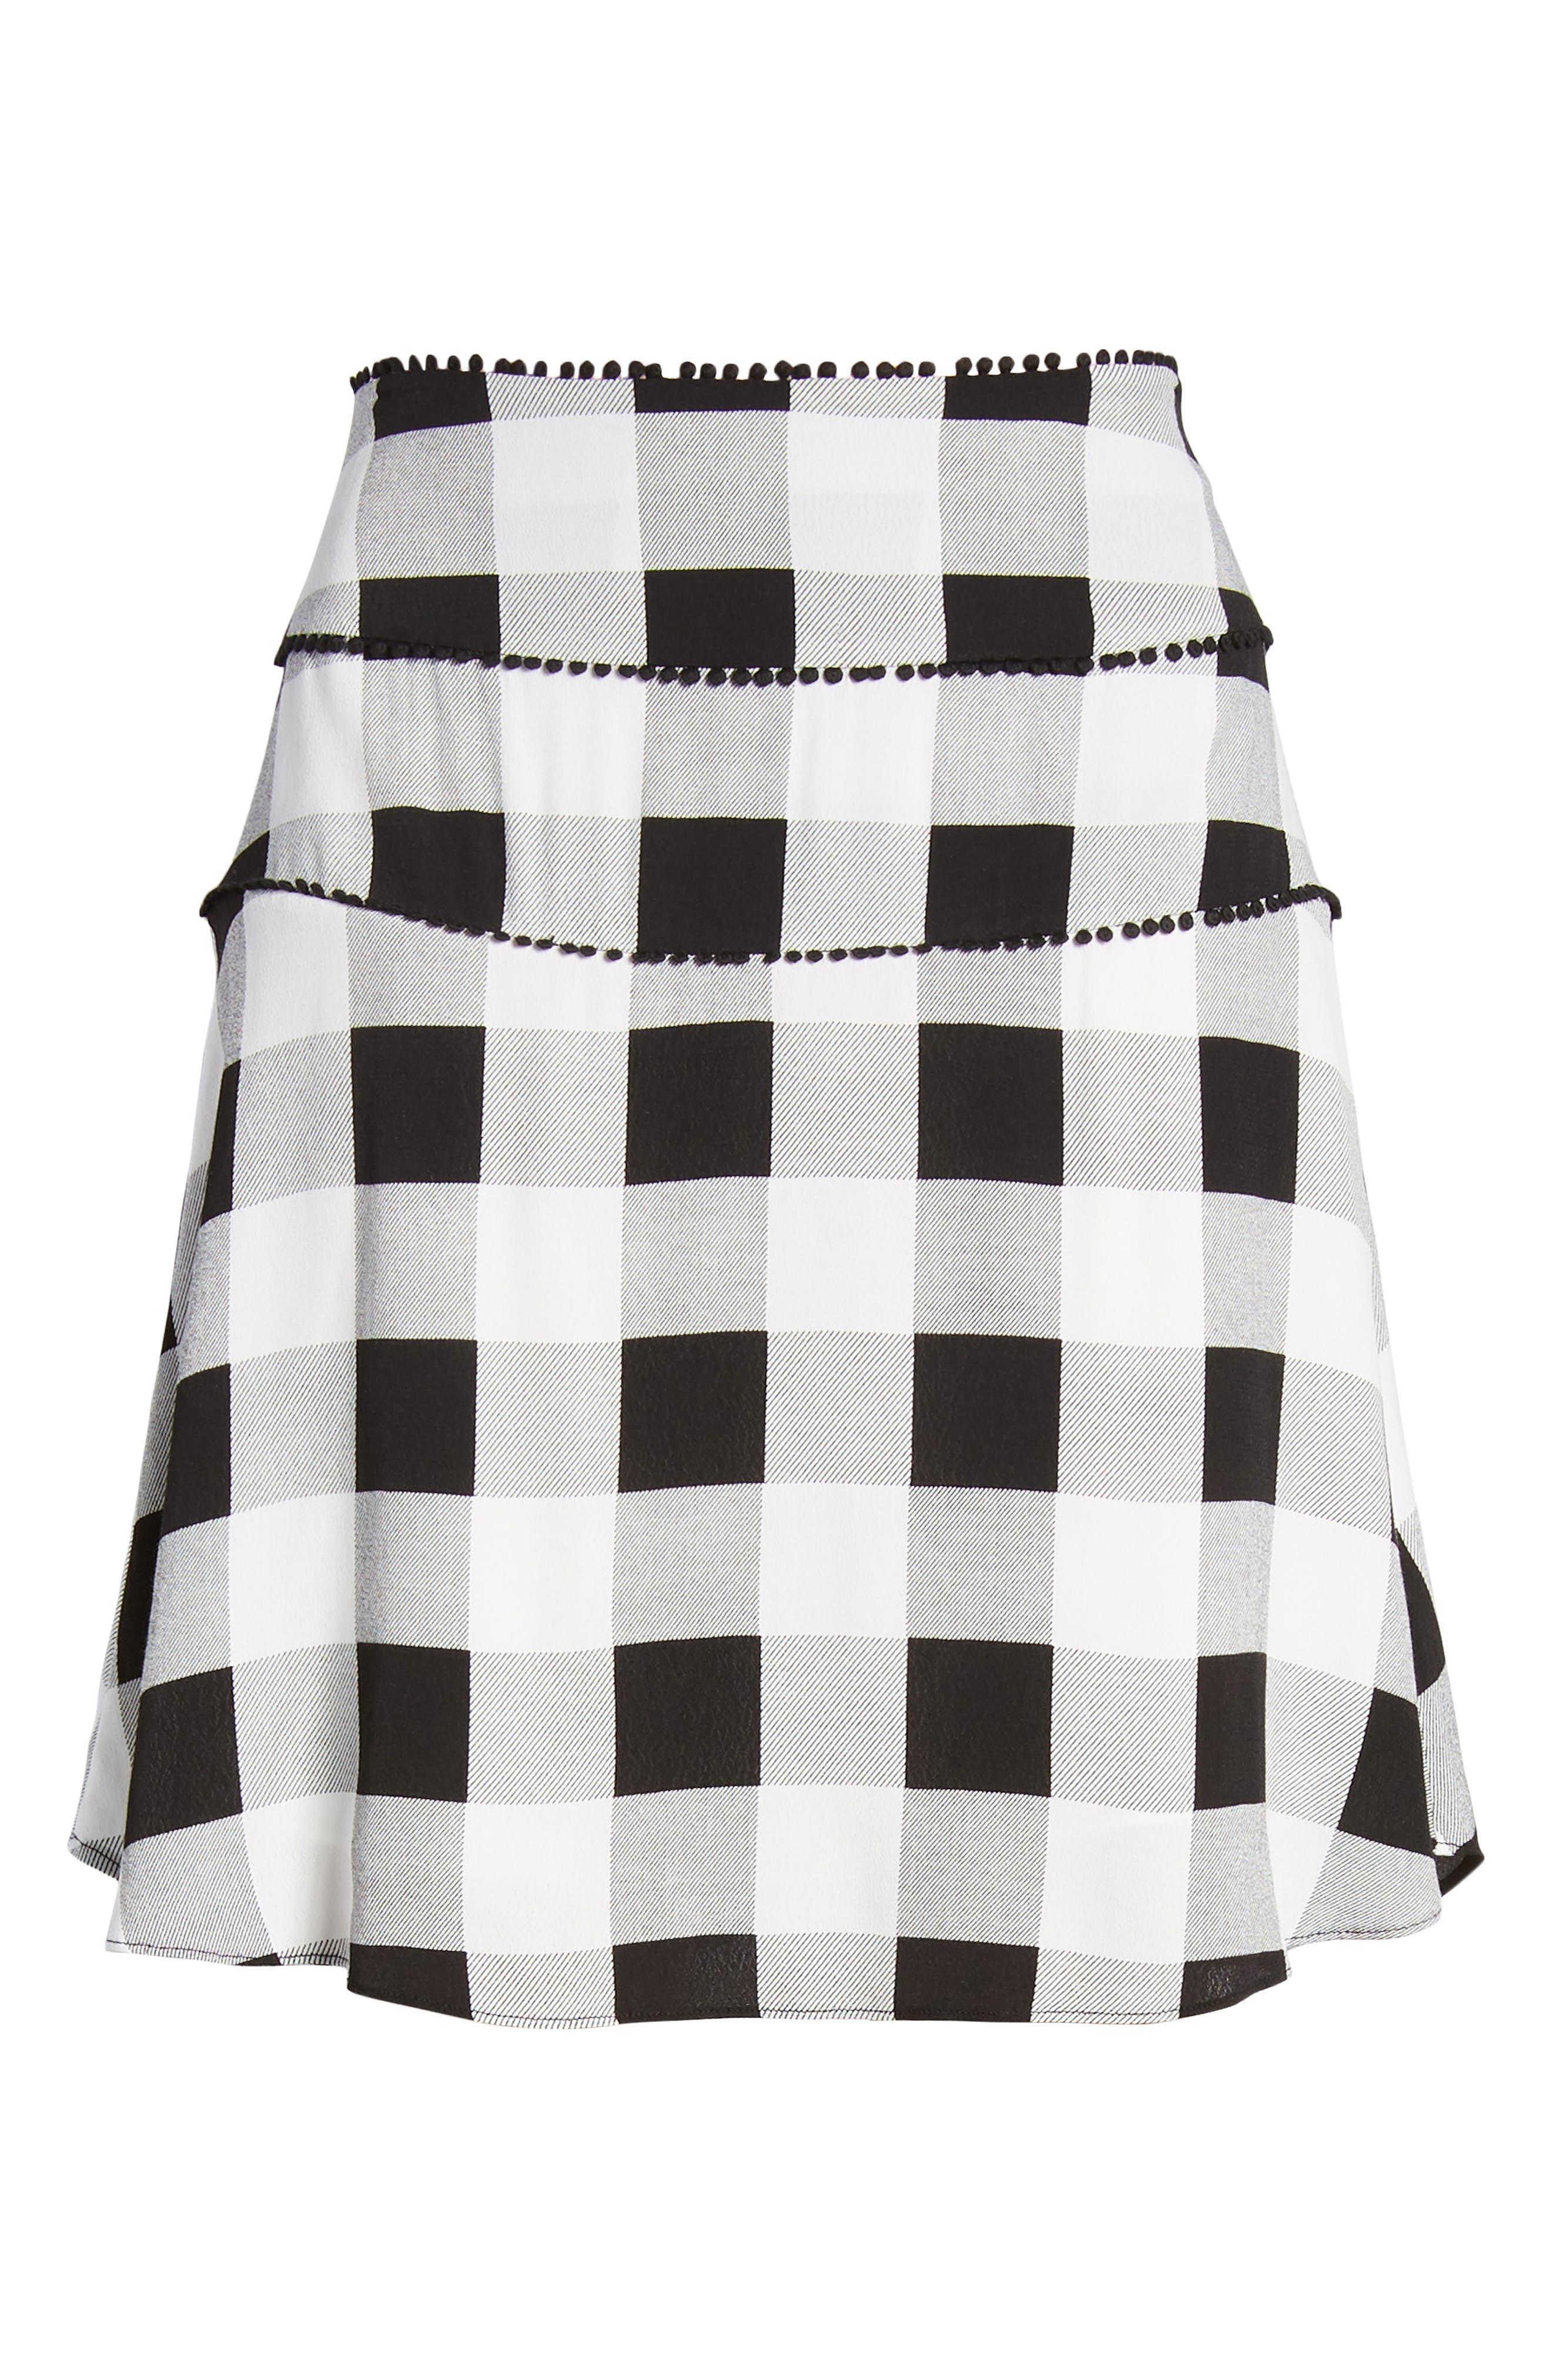 Bell High Waist Miniskirt,                             Alternate thumbnail 6, color,                             002